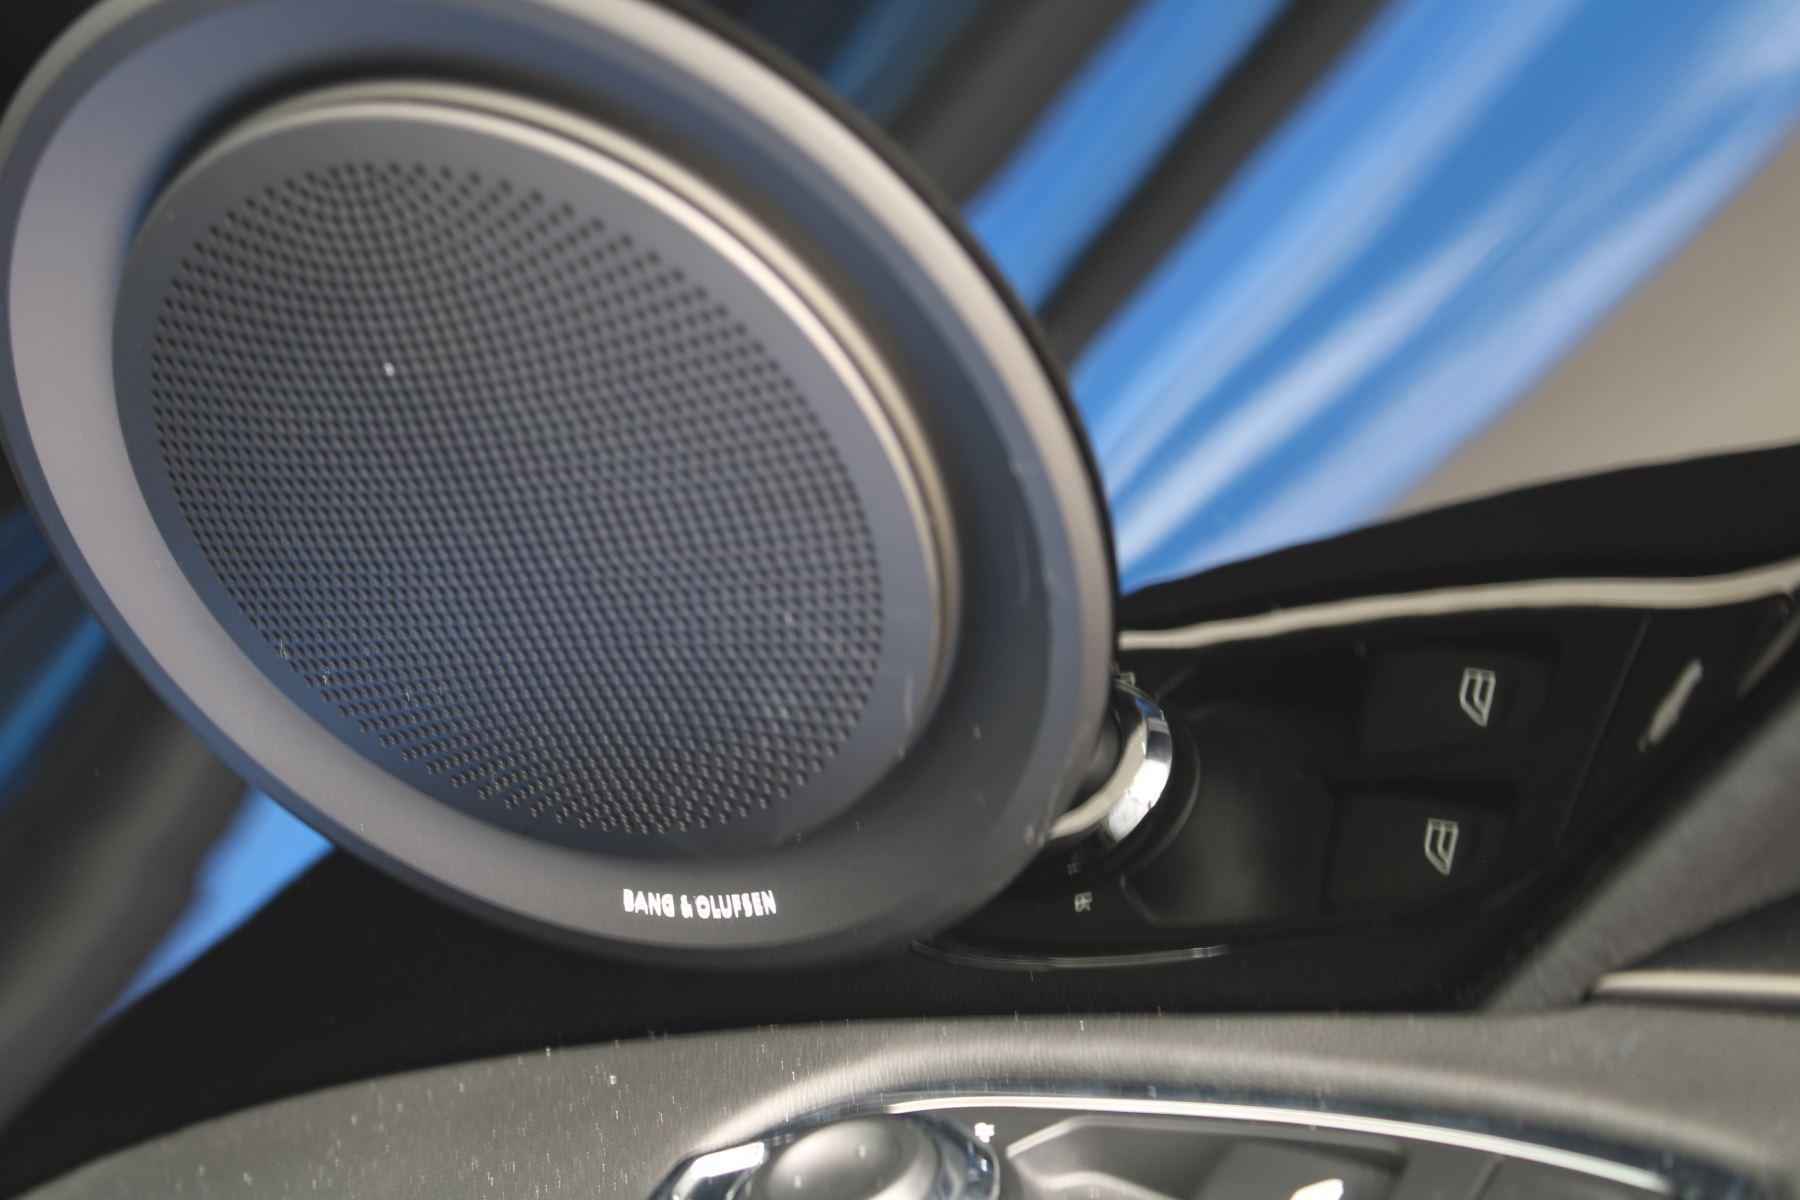 Aston Martin DBS V12 Superleggera Touchtronic Special Ceramic Blue - B&O image 22